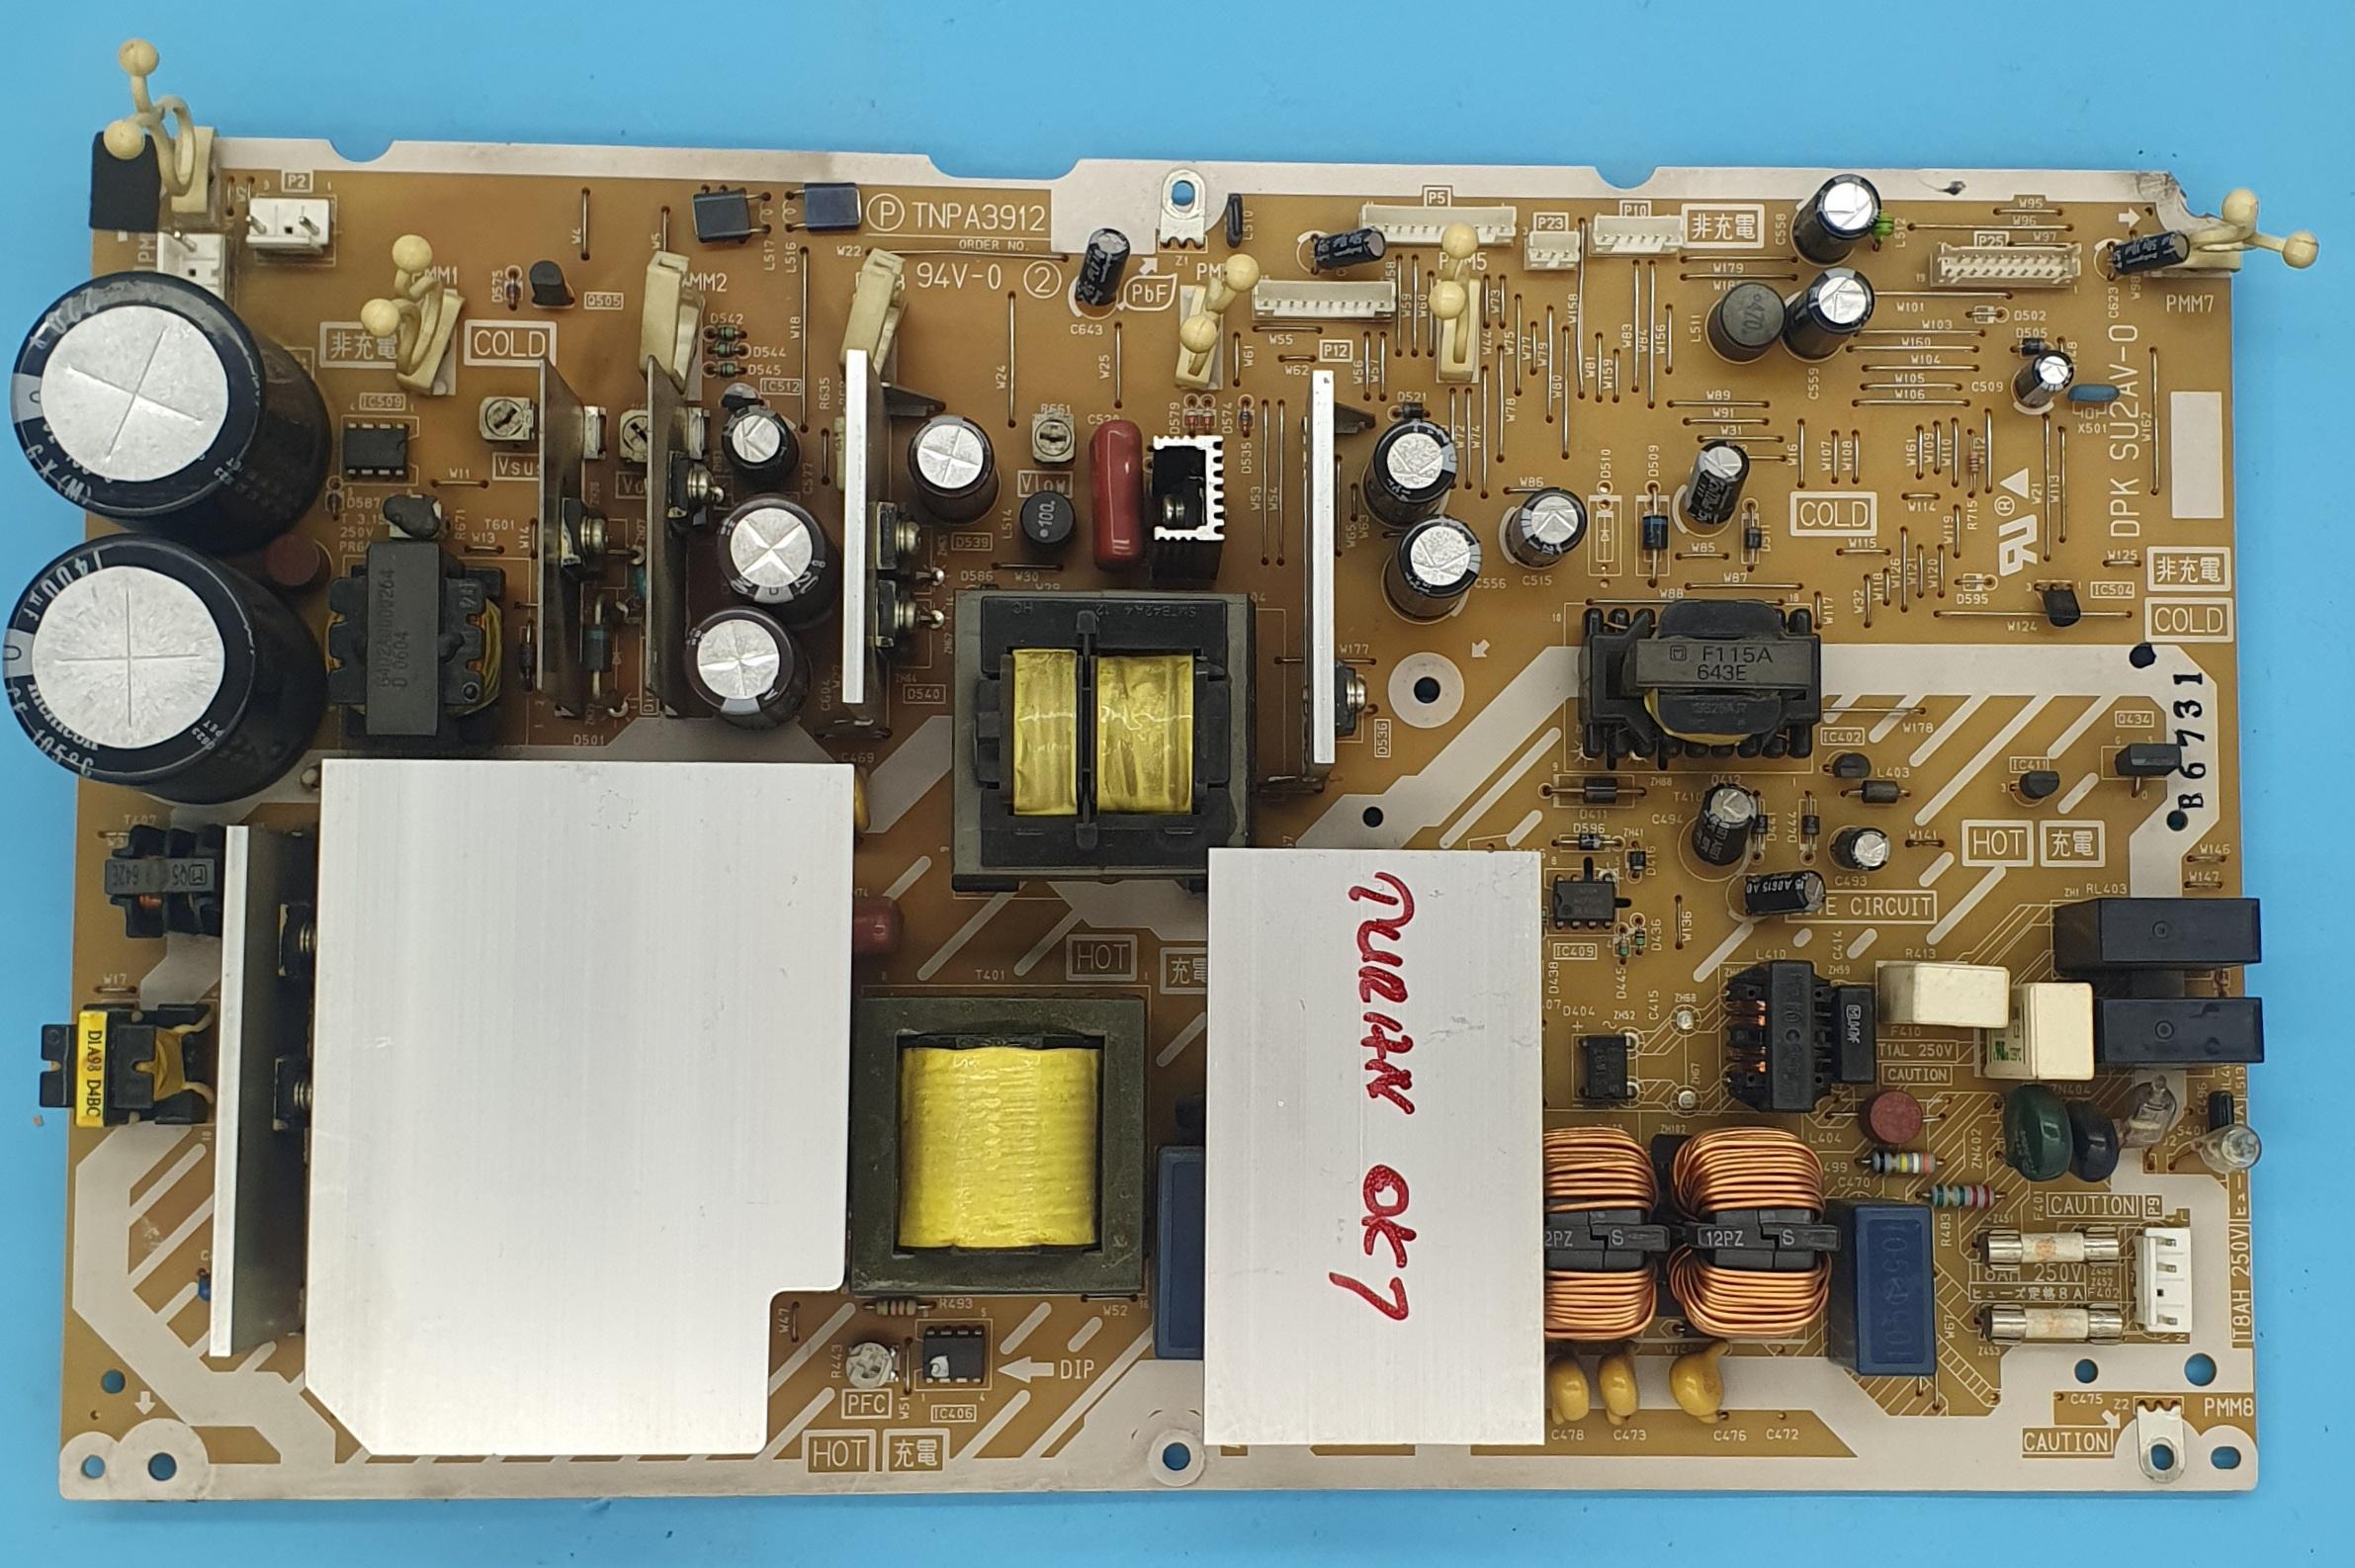 TNPA3912 Panasonic Power (KDV DAHİL = 200 TL)